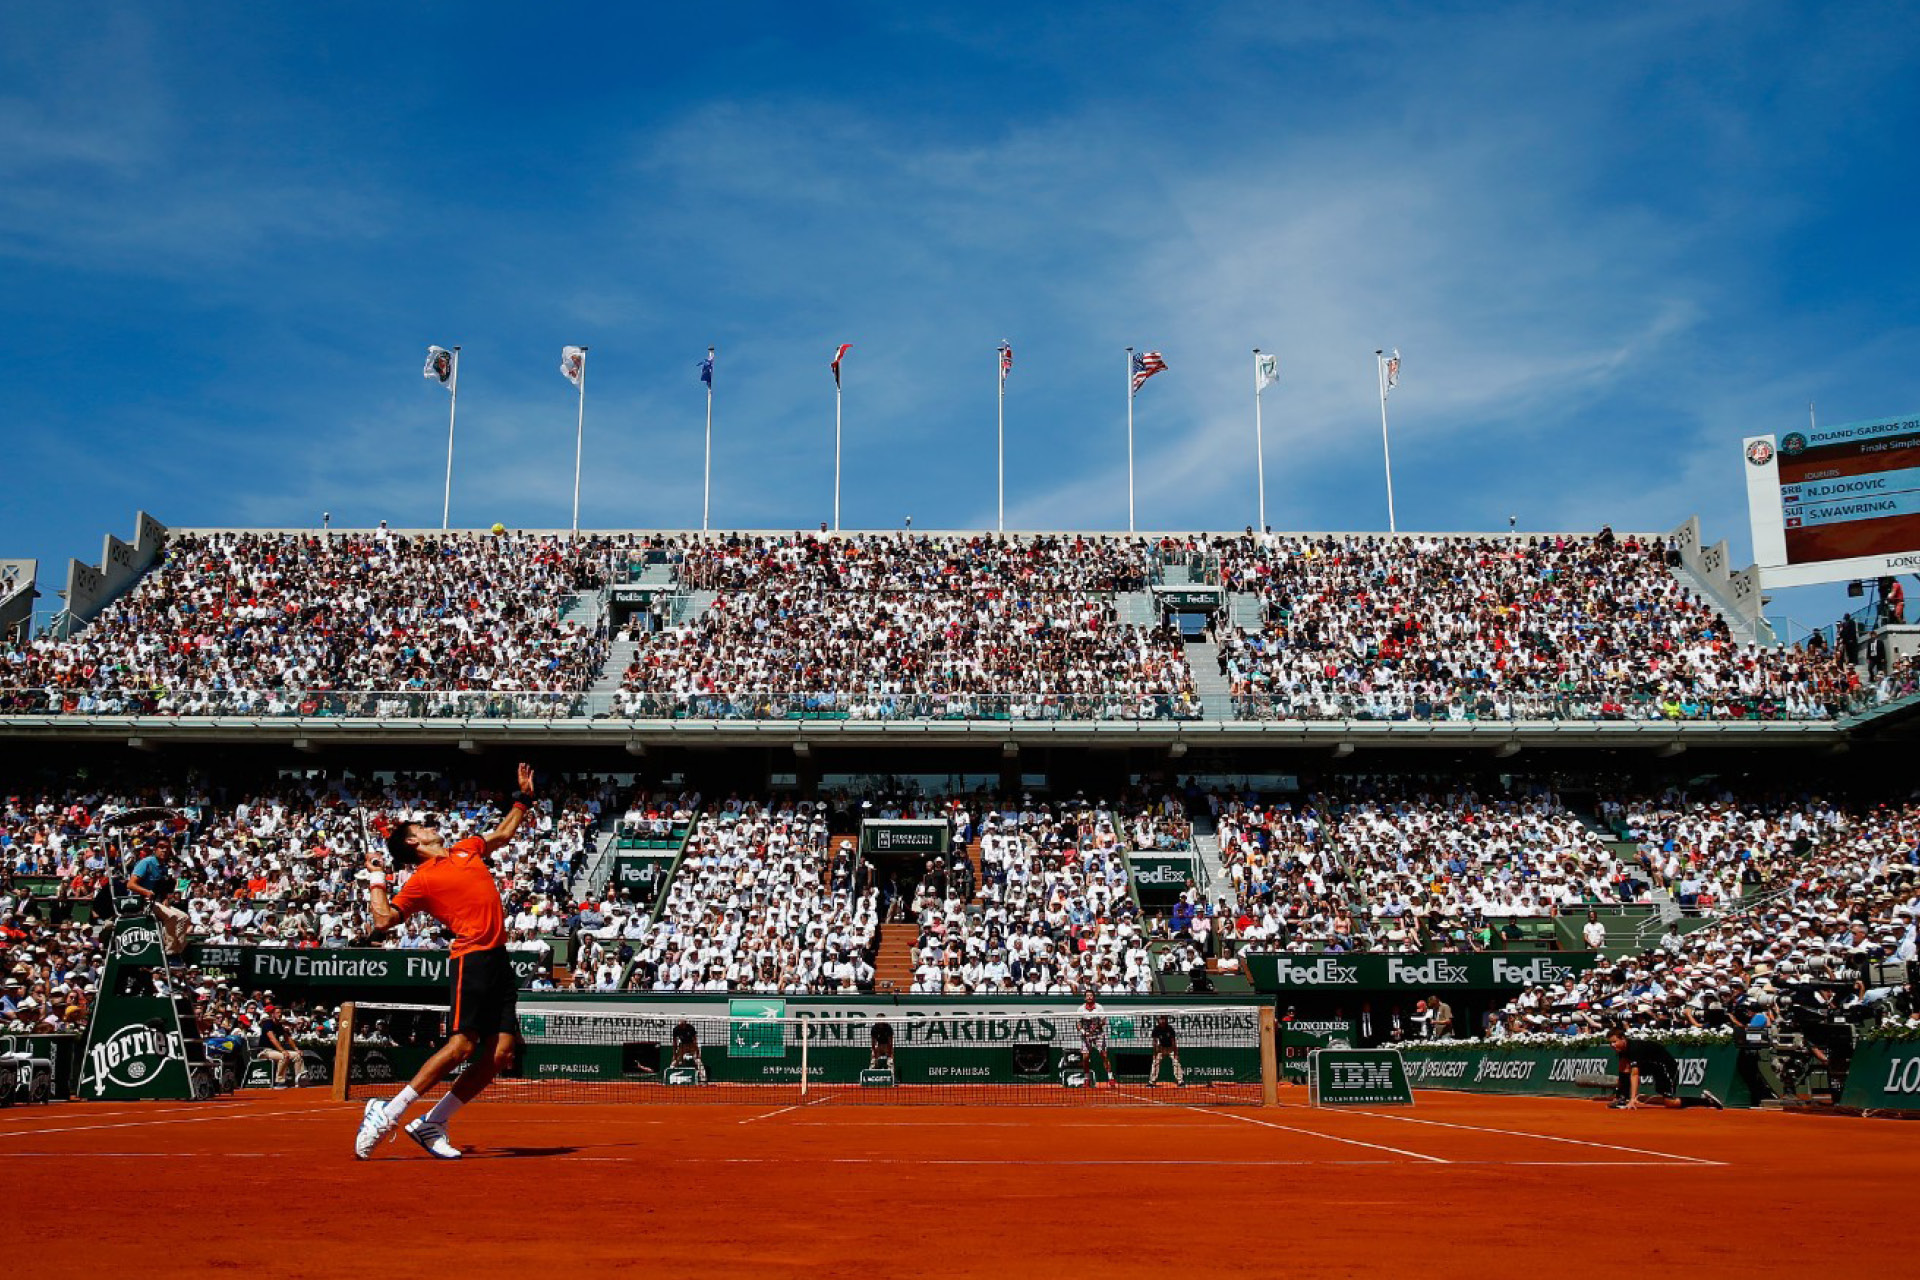 Roland Garros Images-1.jpg